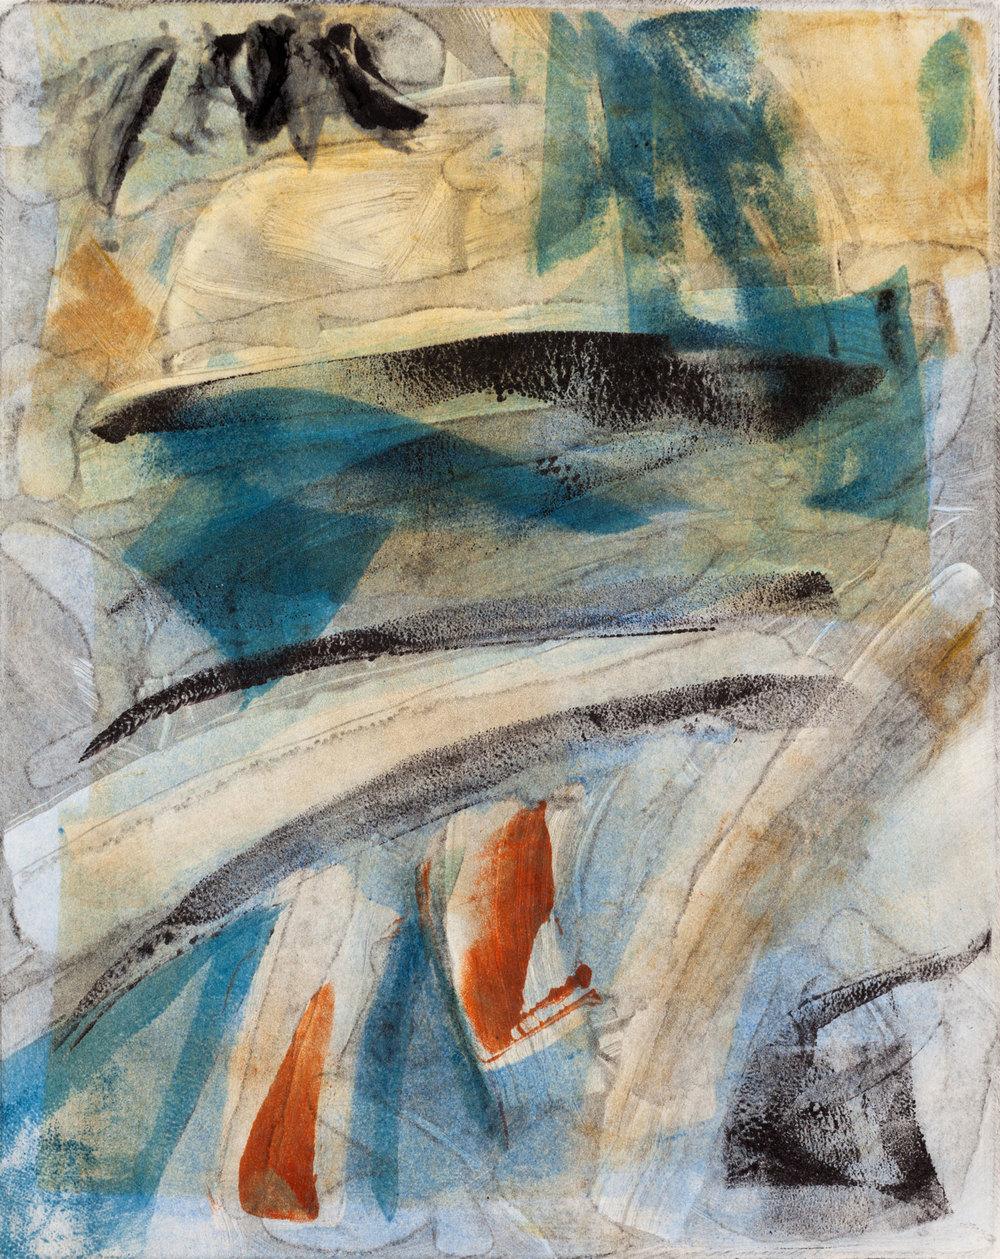 "The Mandarin , 2013, monoprint, 8 x 10"", SOLD"